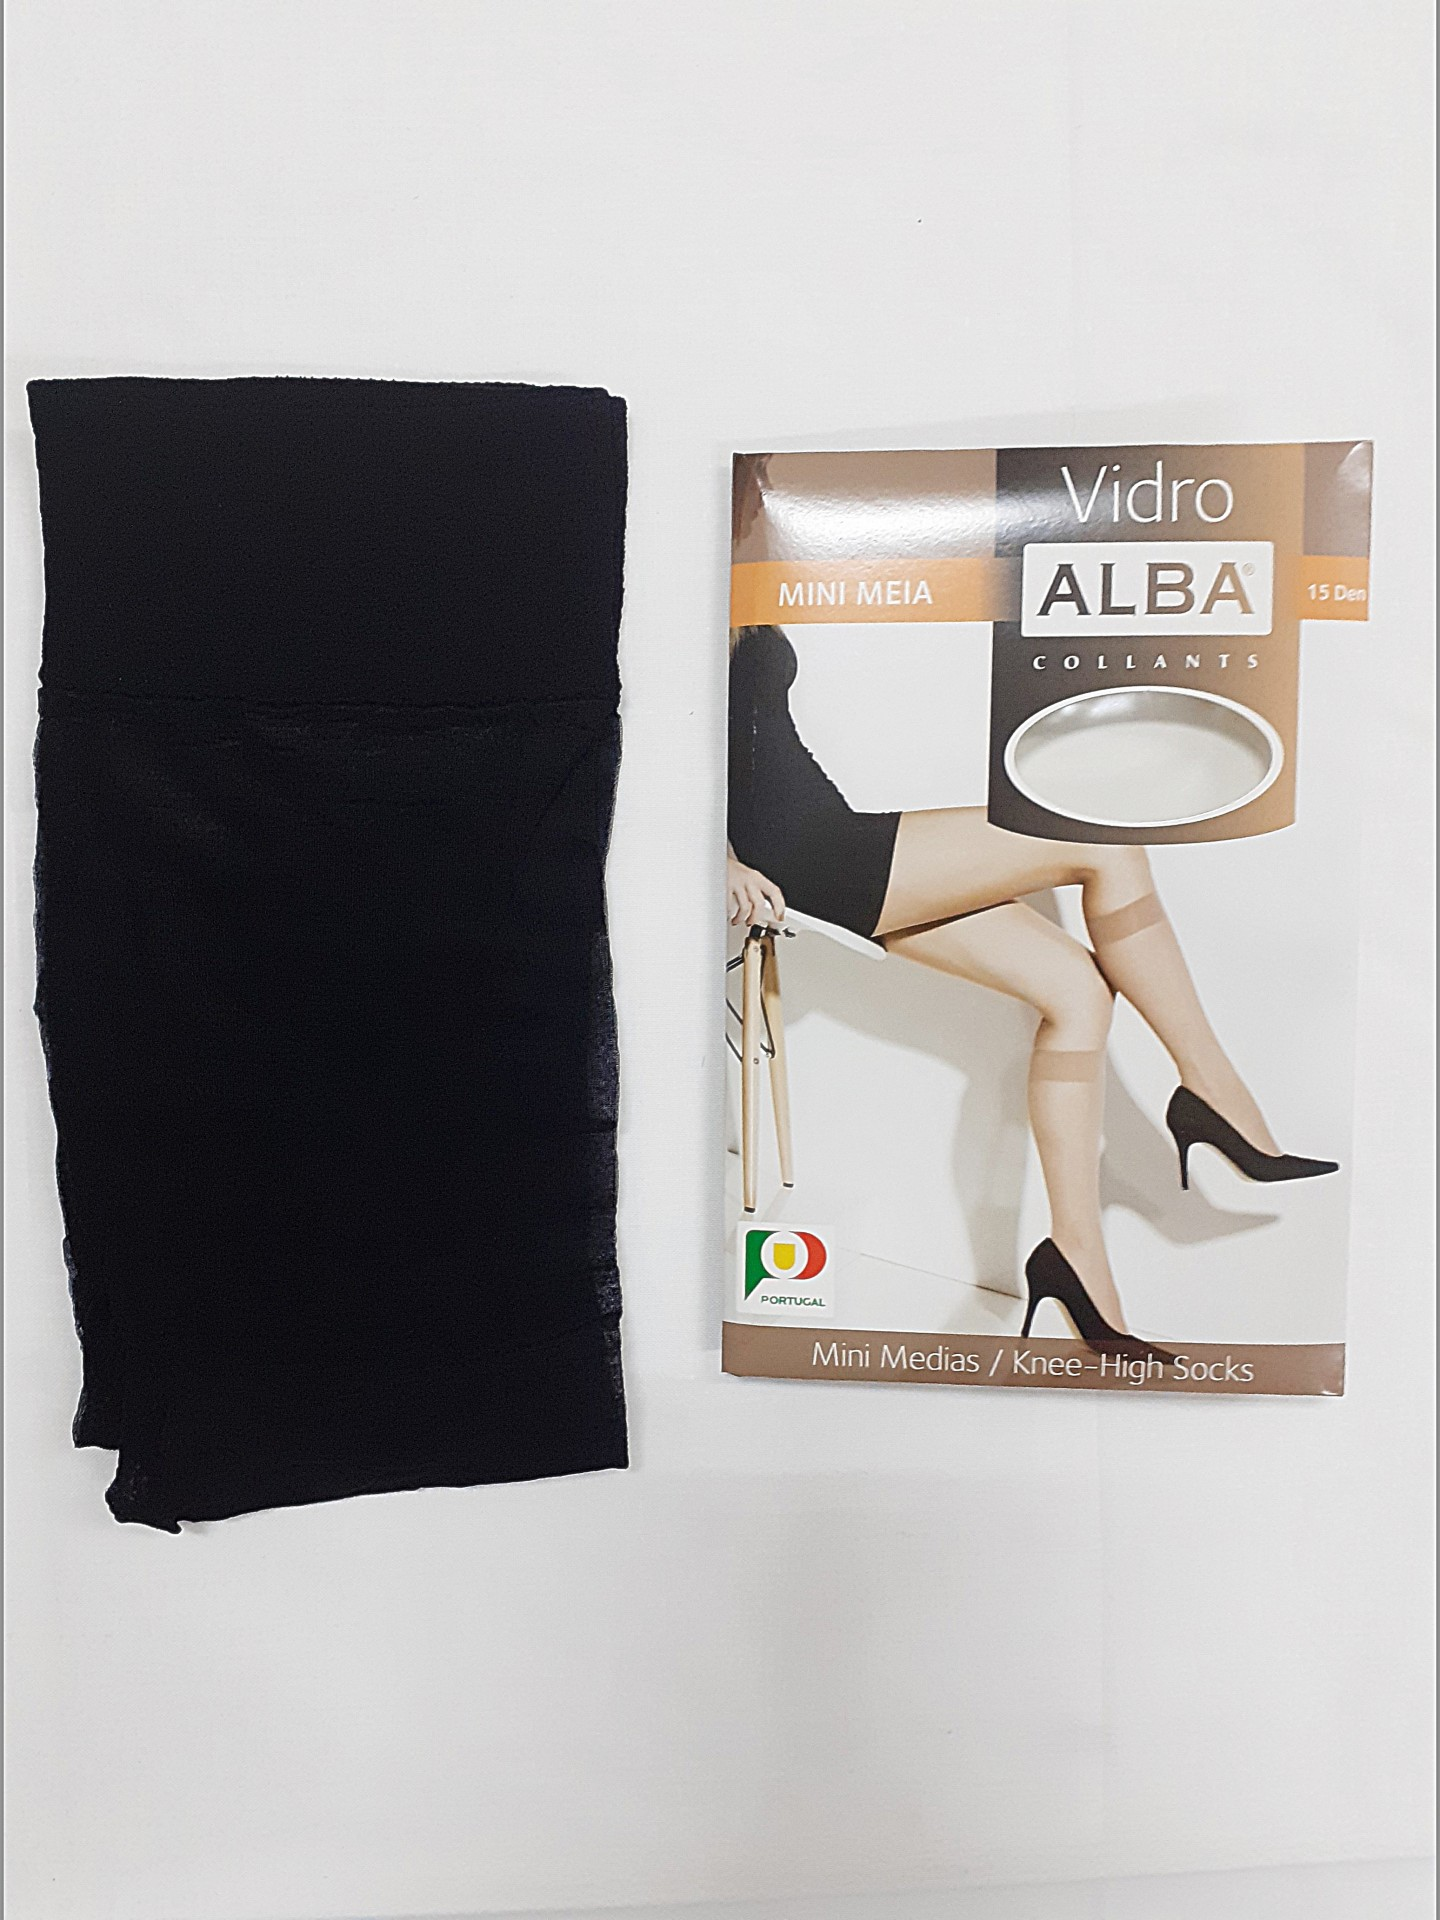 Mini Meia Vidro Alba